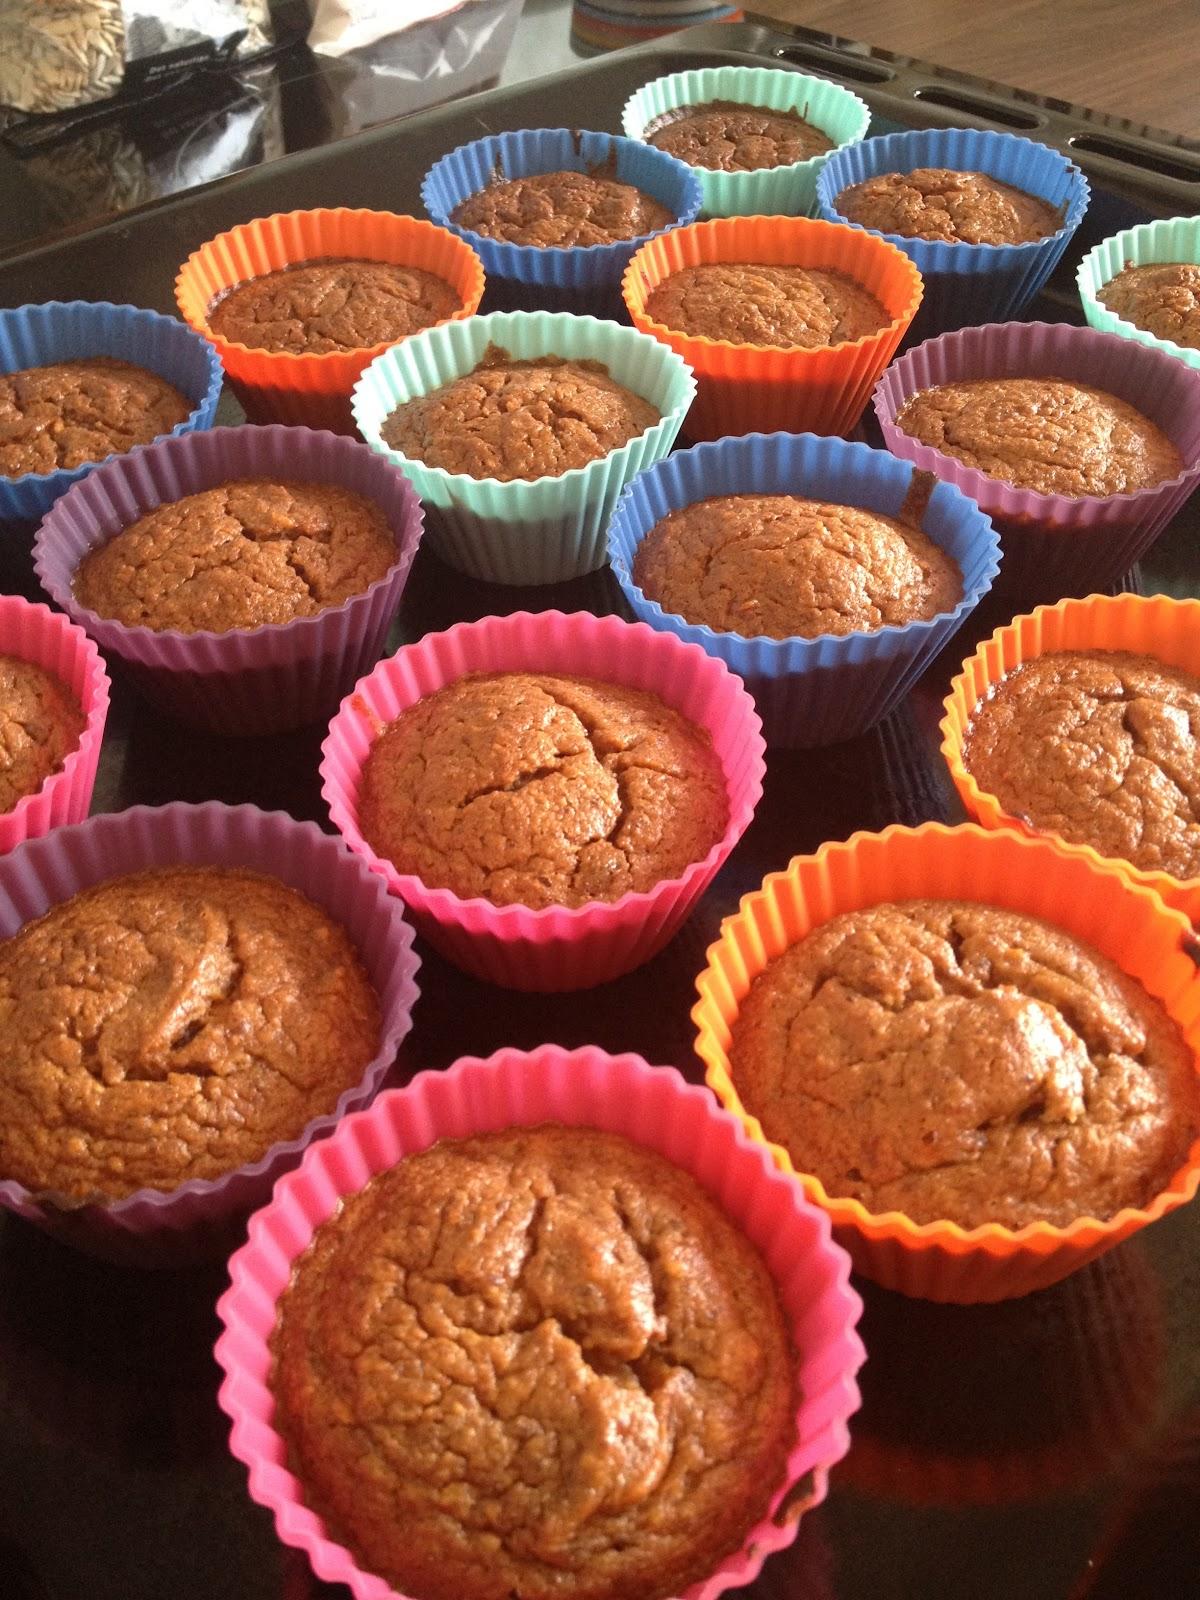 Trendy mama & hverdagens strabadser!: Sunde muffins!